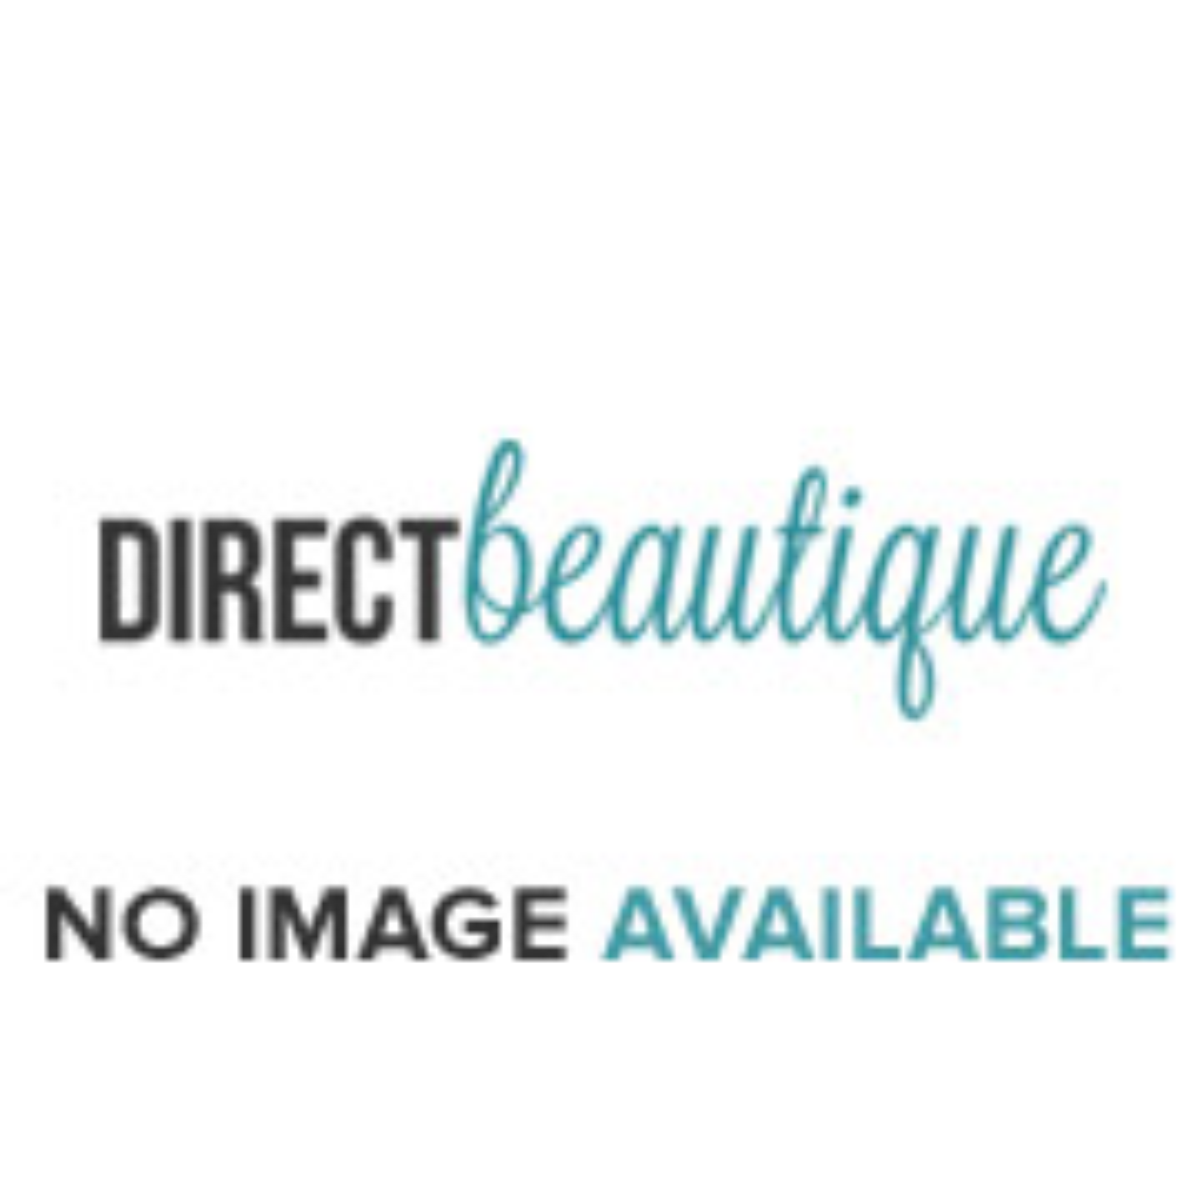 Thierry Mugler Mugler Cologne 300ml EDT Splash & Spray